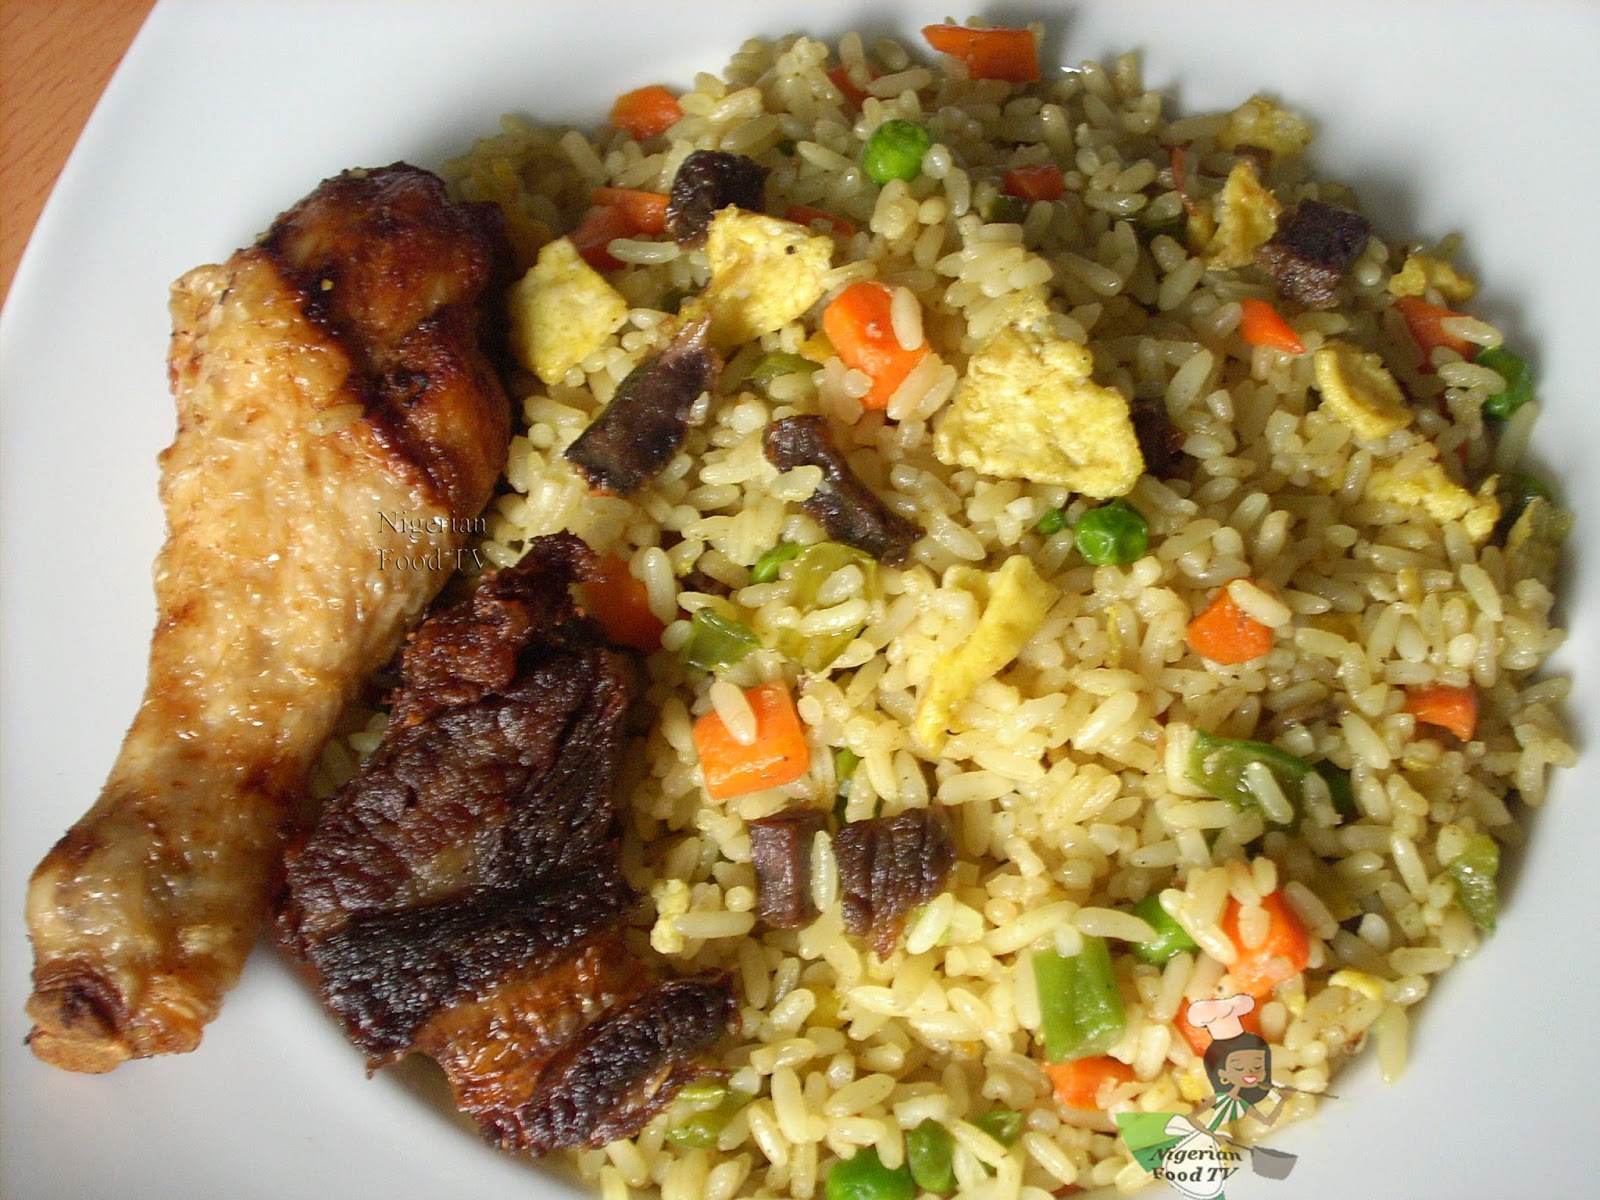 Introducing Naija Kitchen: Learn To Cook Yummy Nigerian ...